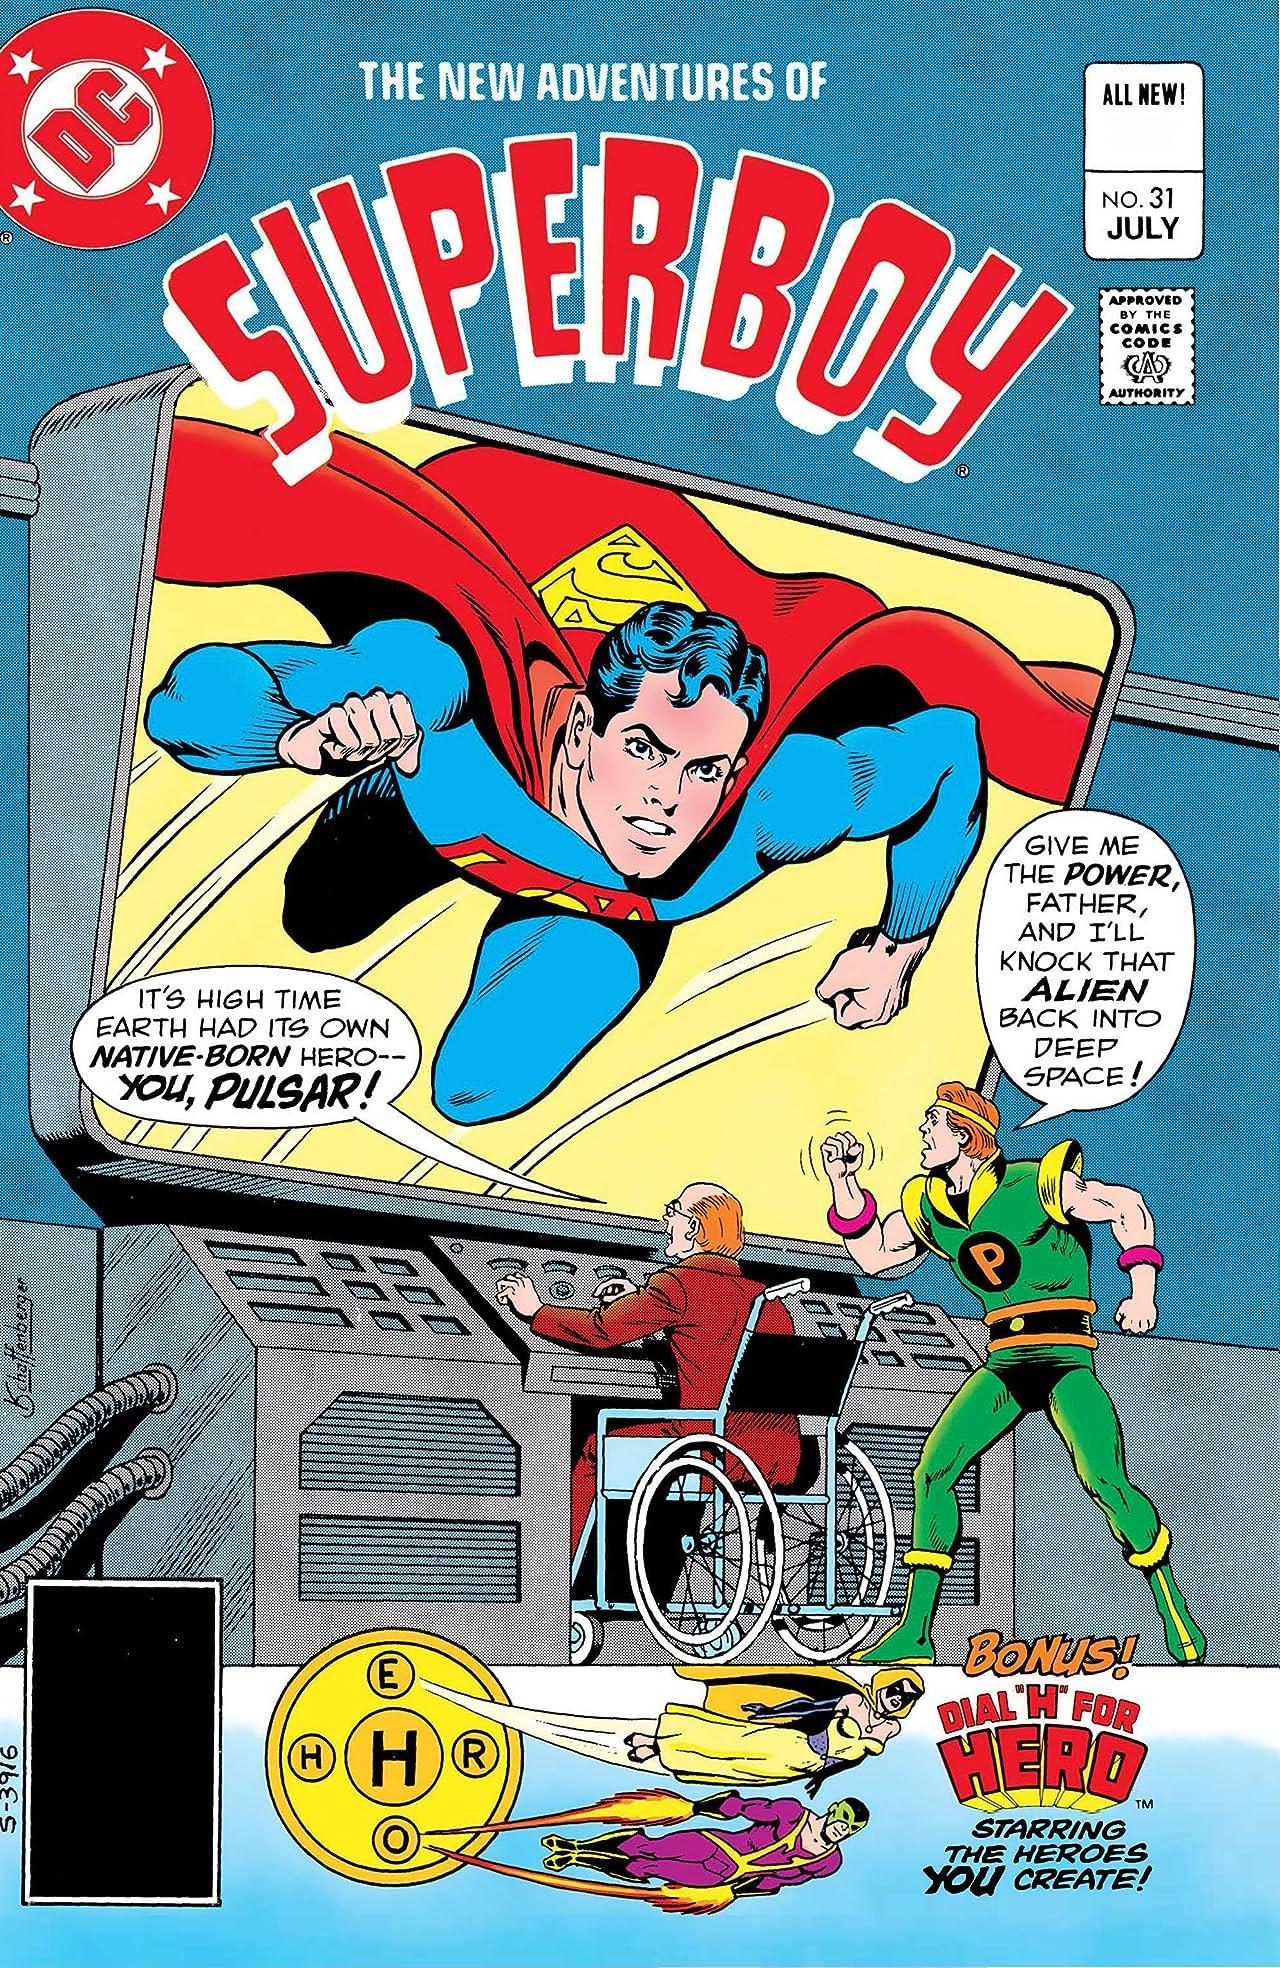 New Adventures of Superboy (1980-1984) #31